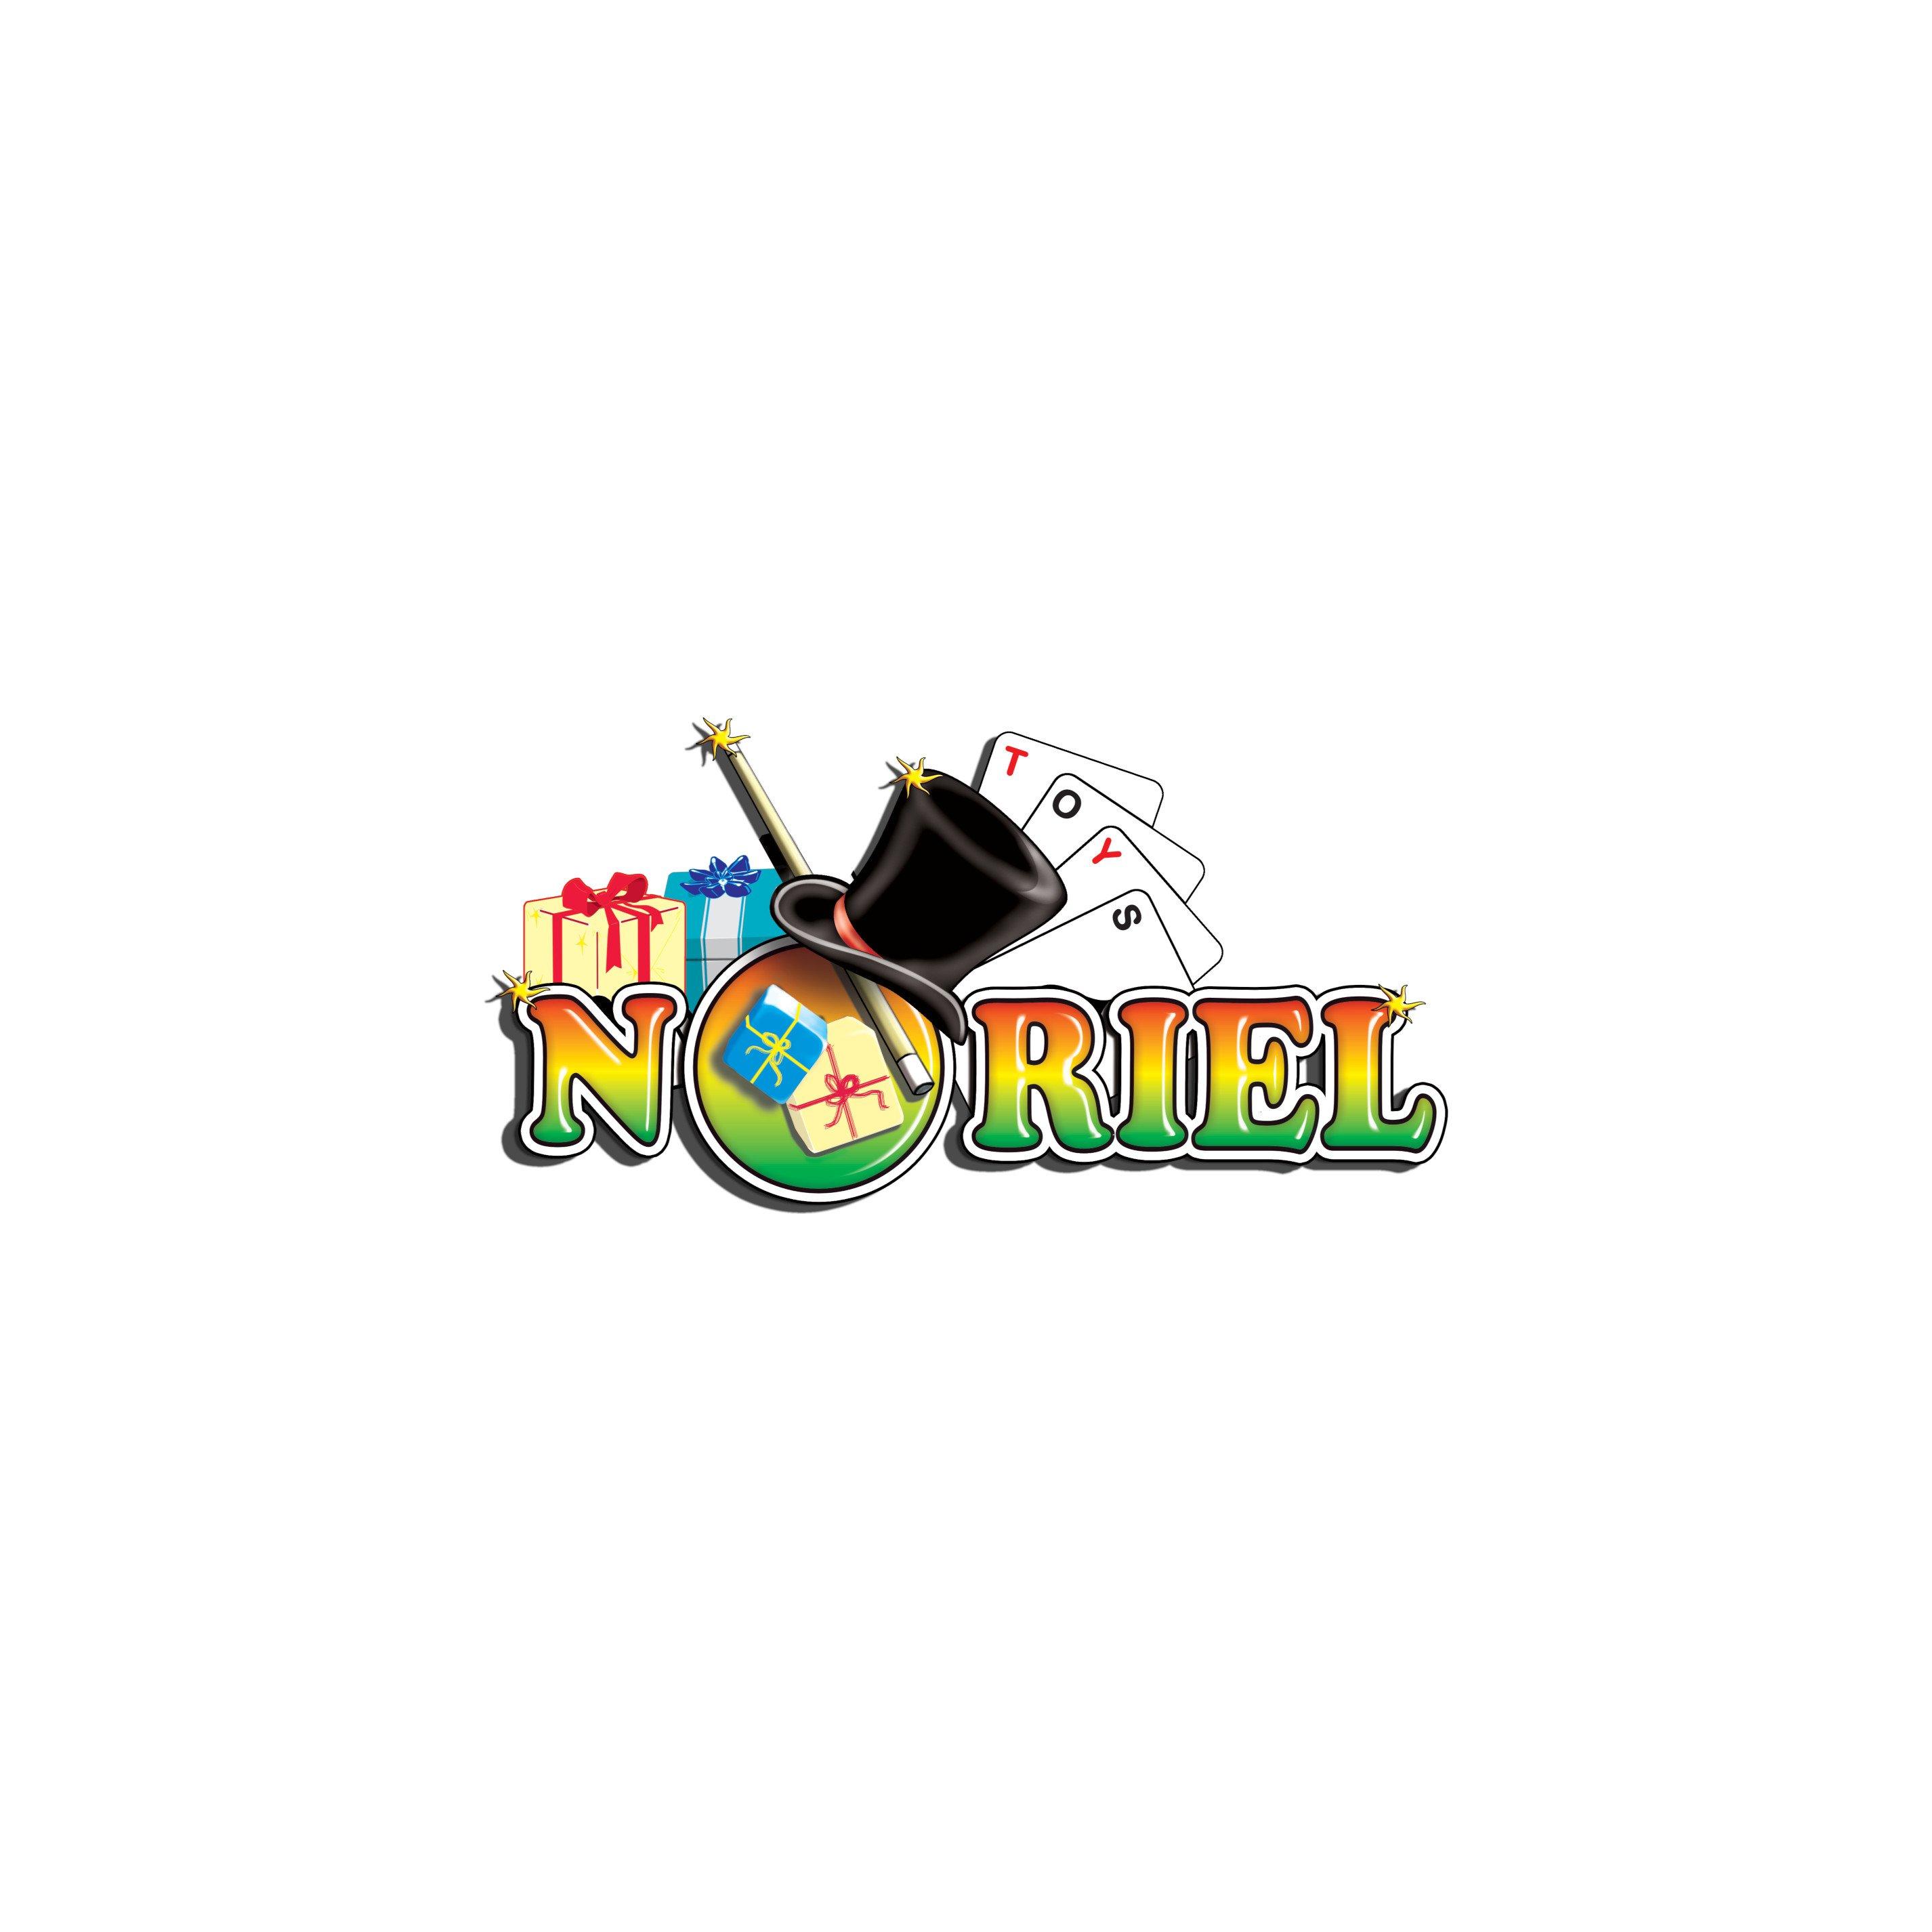 34110432 Caciula cu logo Respect The Vibe, Minoti Winner